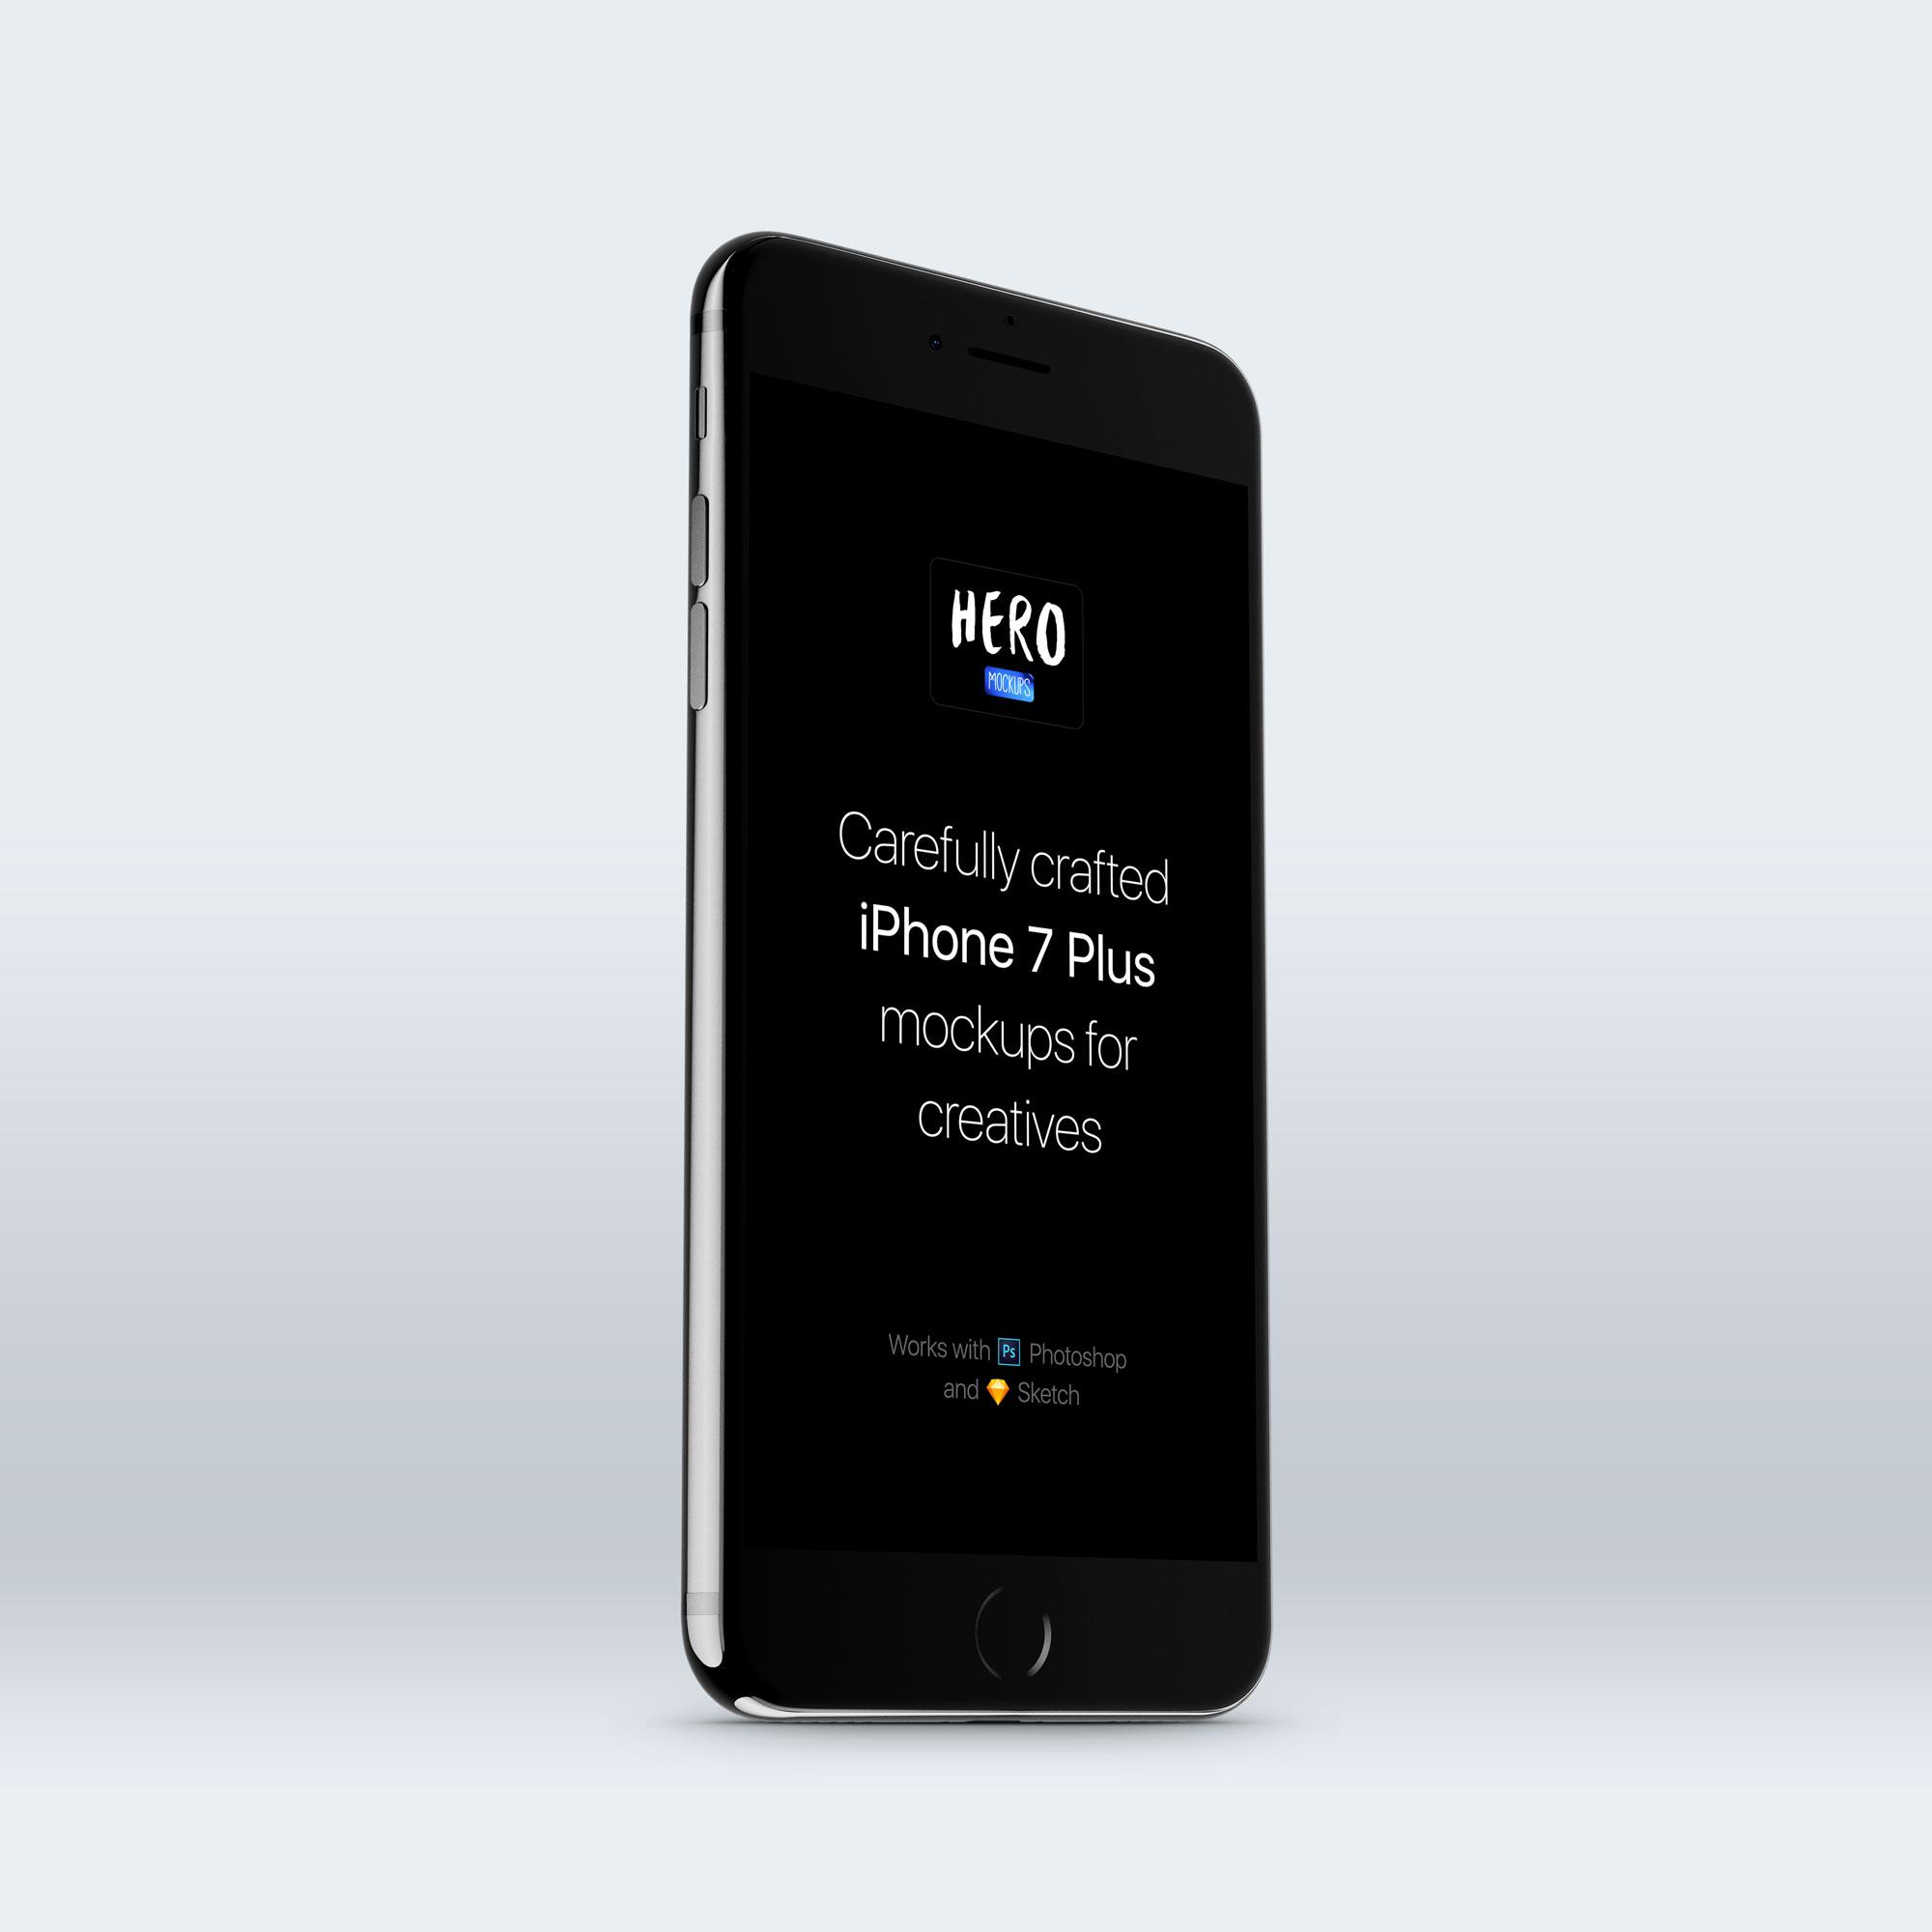 c106d23d9b62305 - 苹果iPhone UI样机